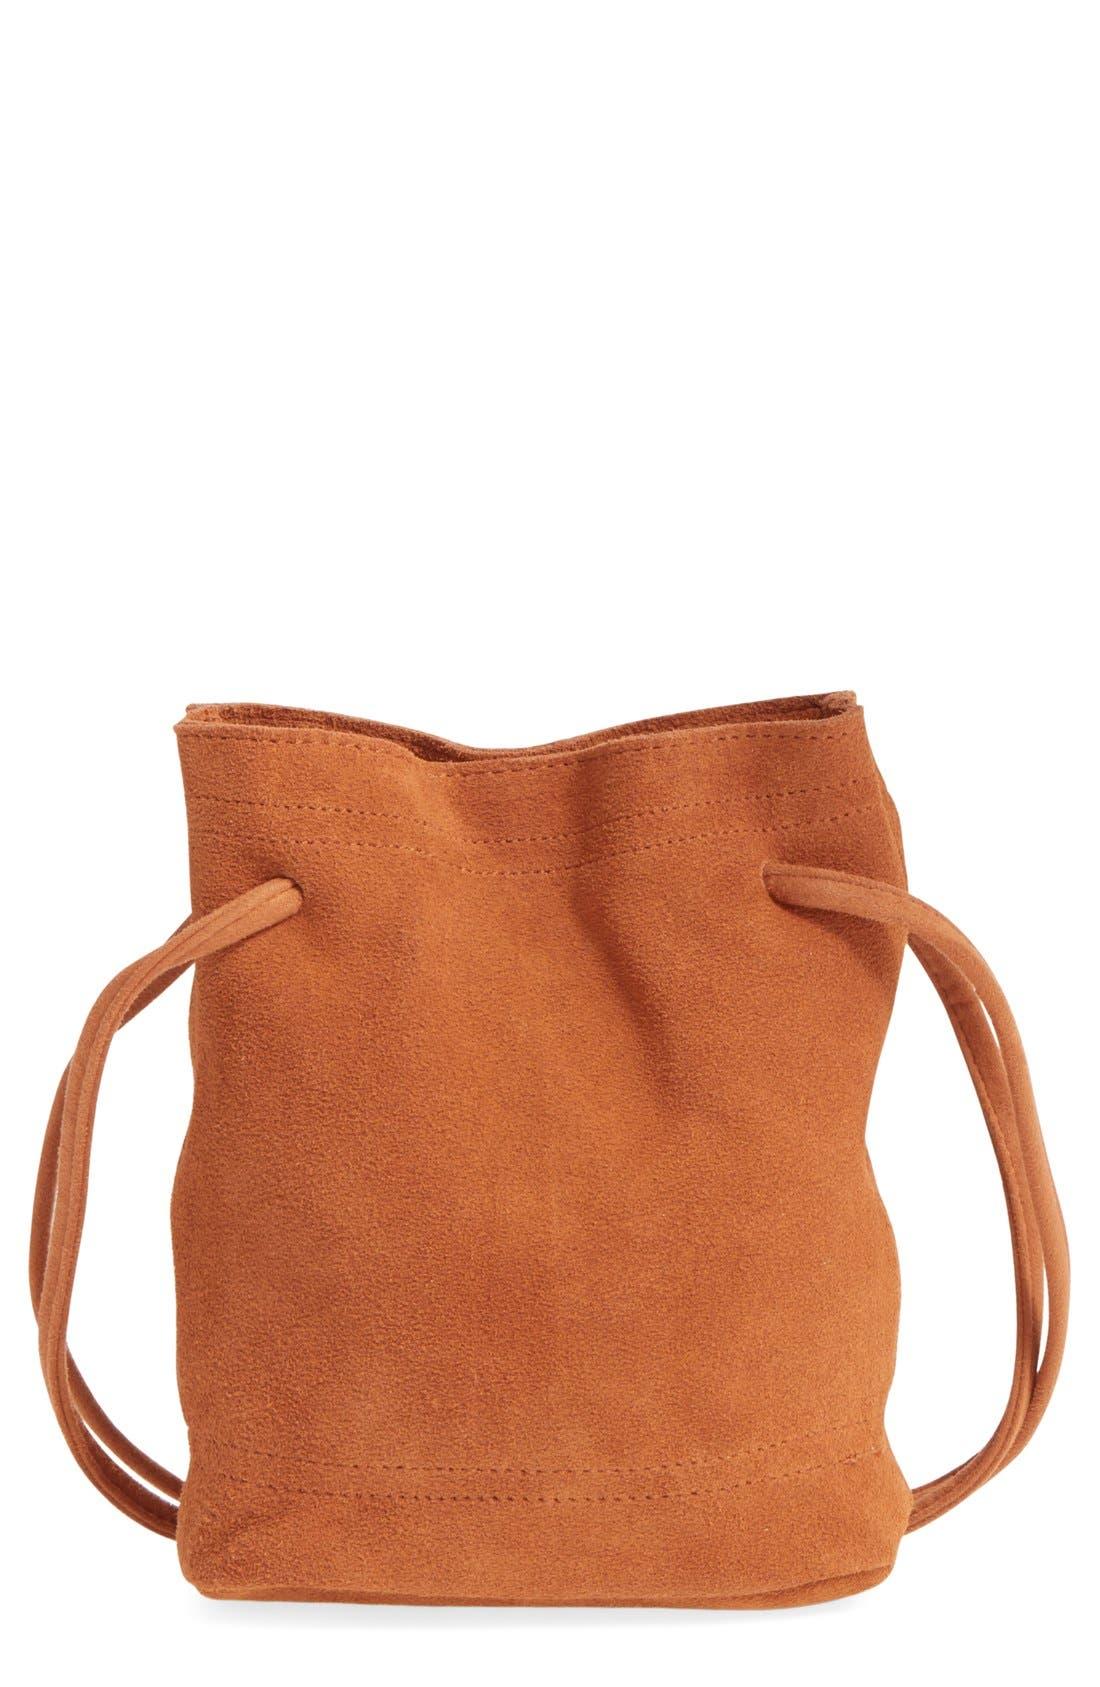 Alternate Image 1 Selected - Street Level Suede Crossbody Bag